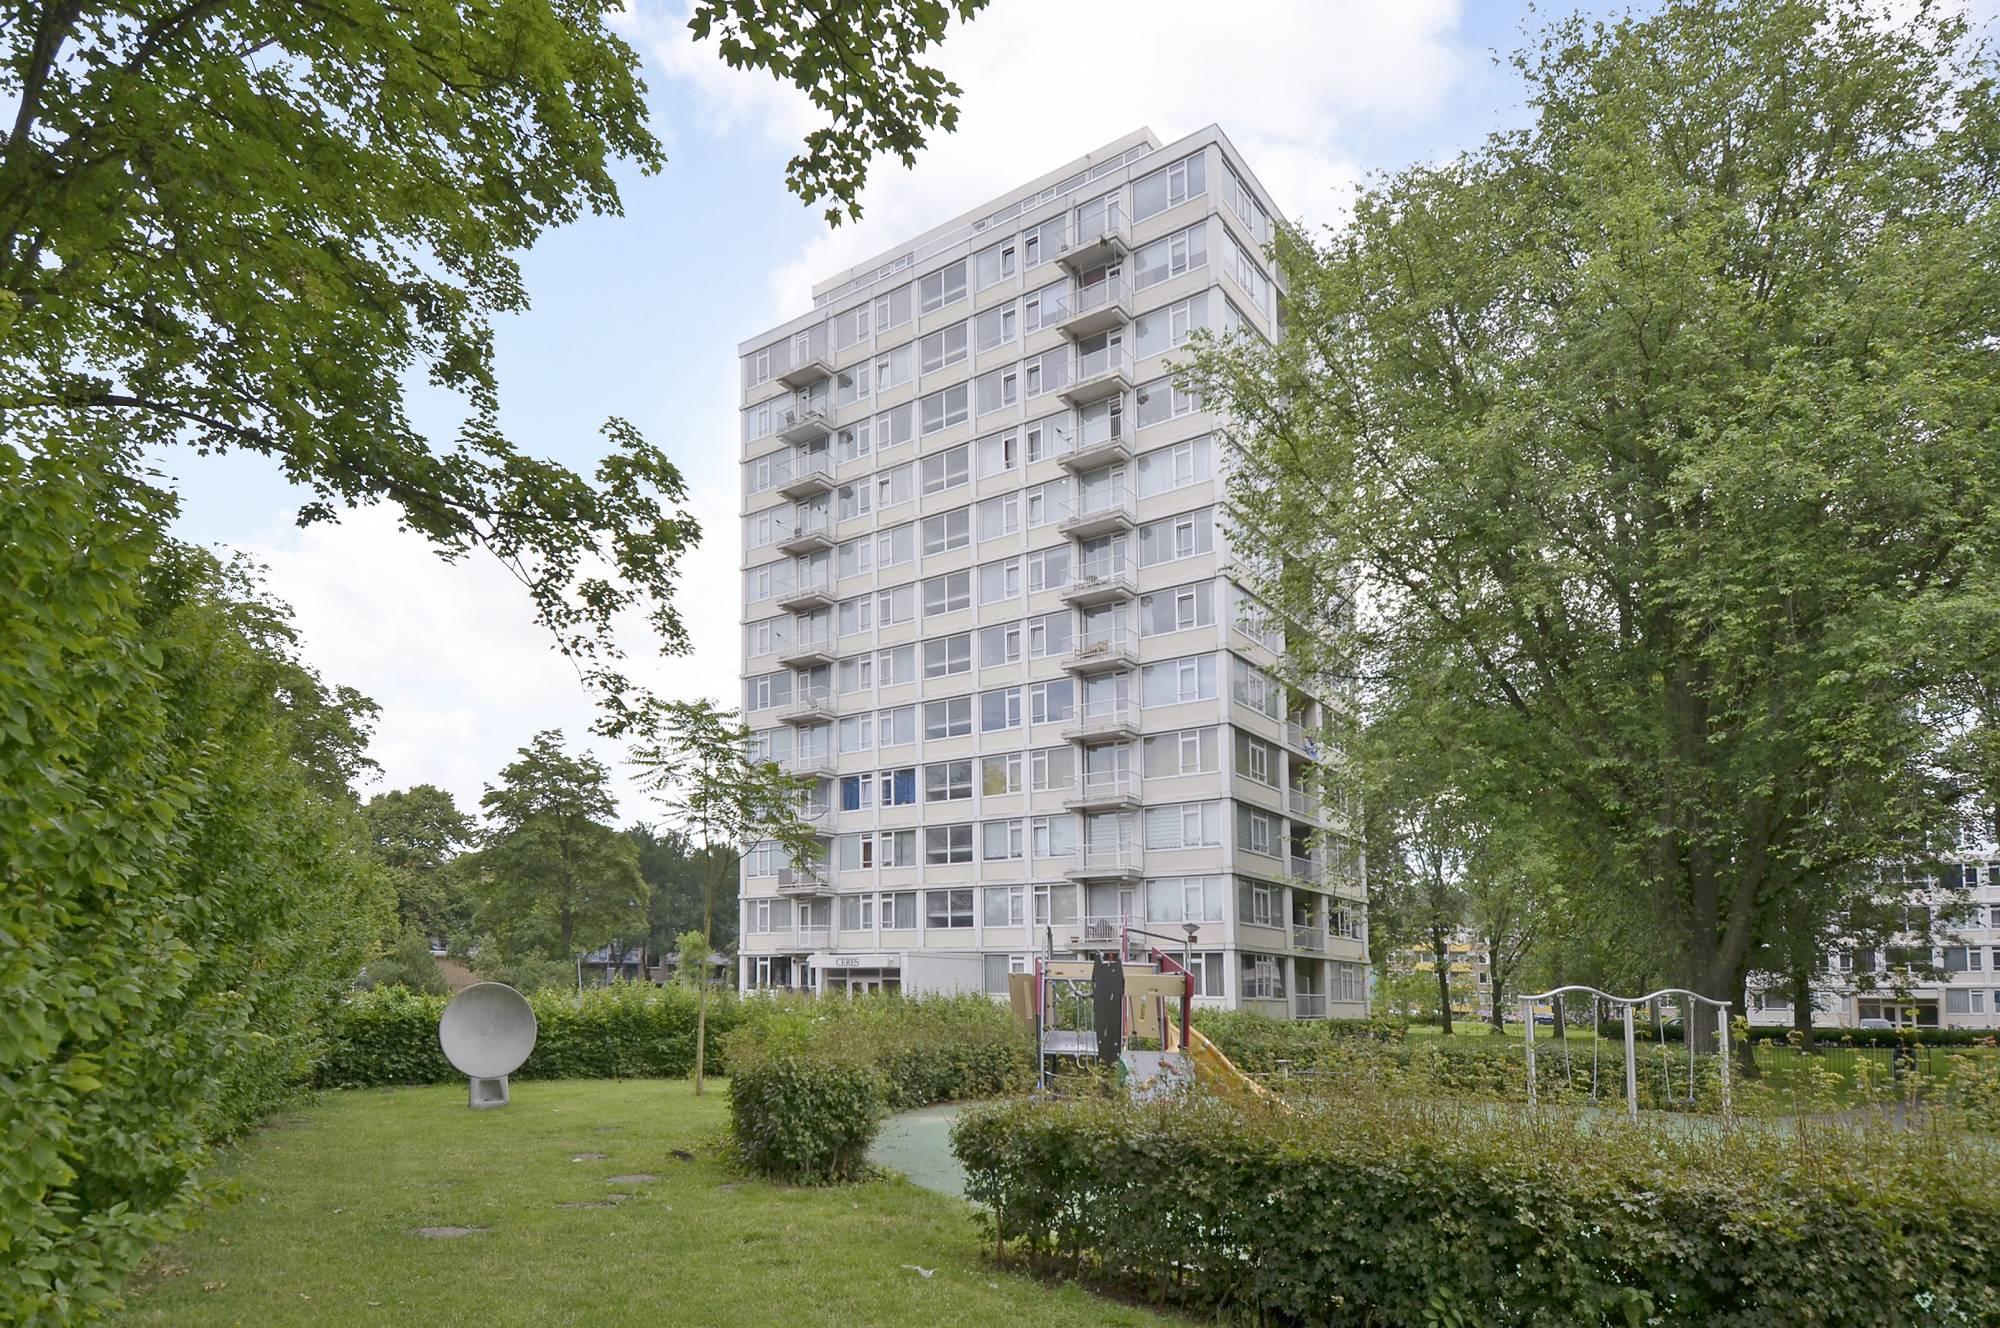 https://public.parariusoffice.nl/185/photos/huge/51287103.1499847497-151.JPG